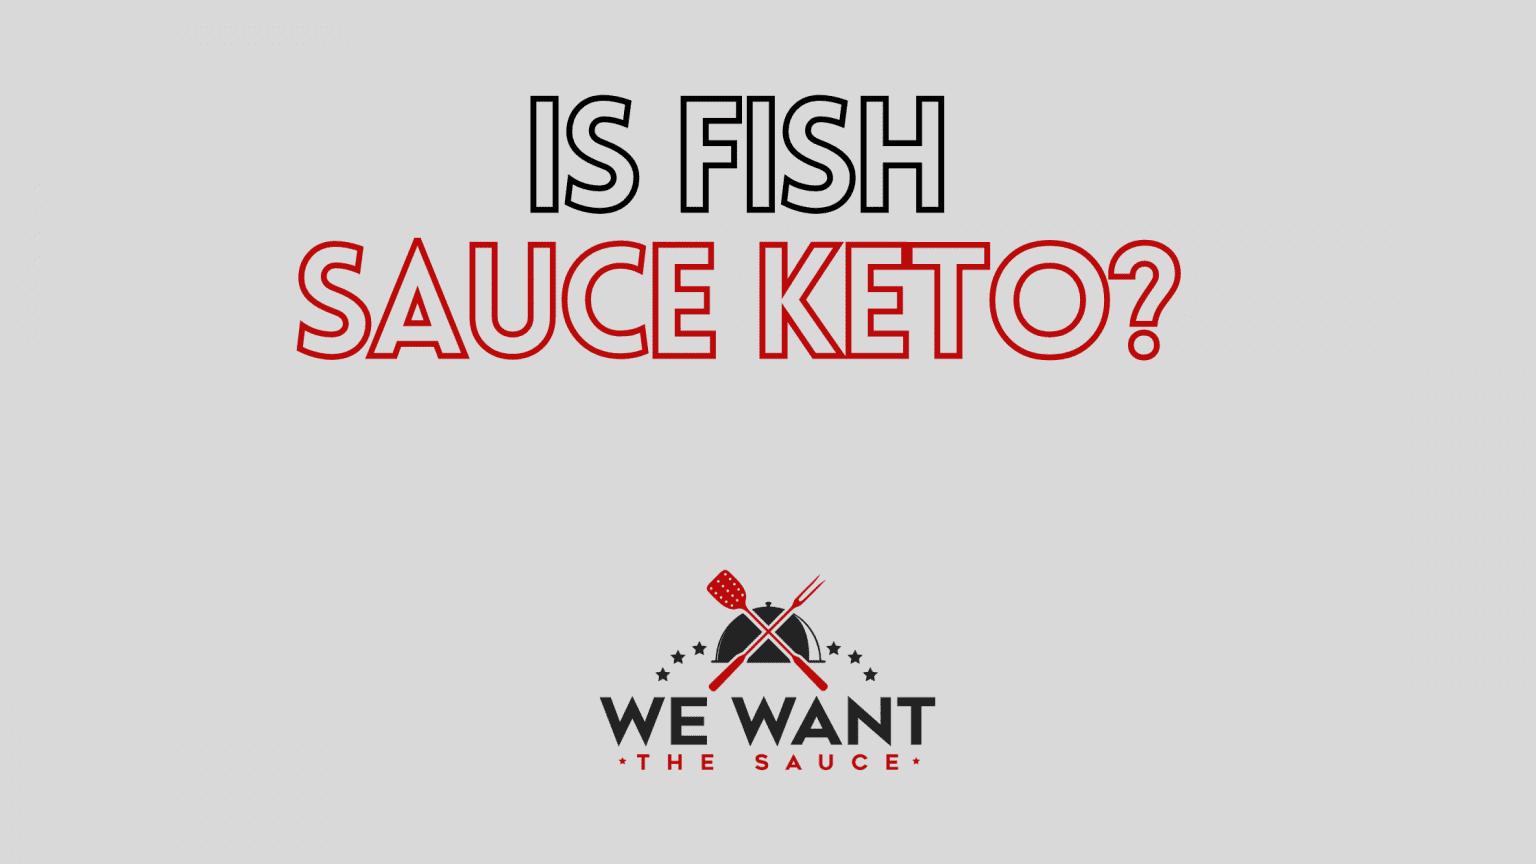 Is Fish Sauce Keto?